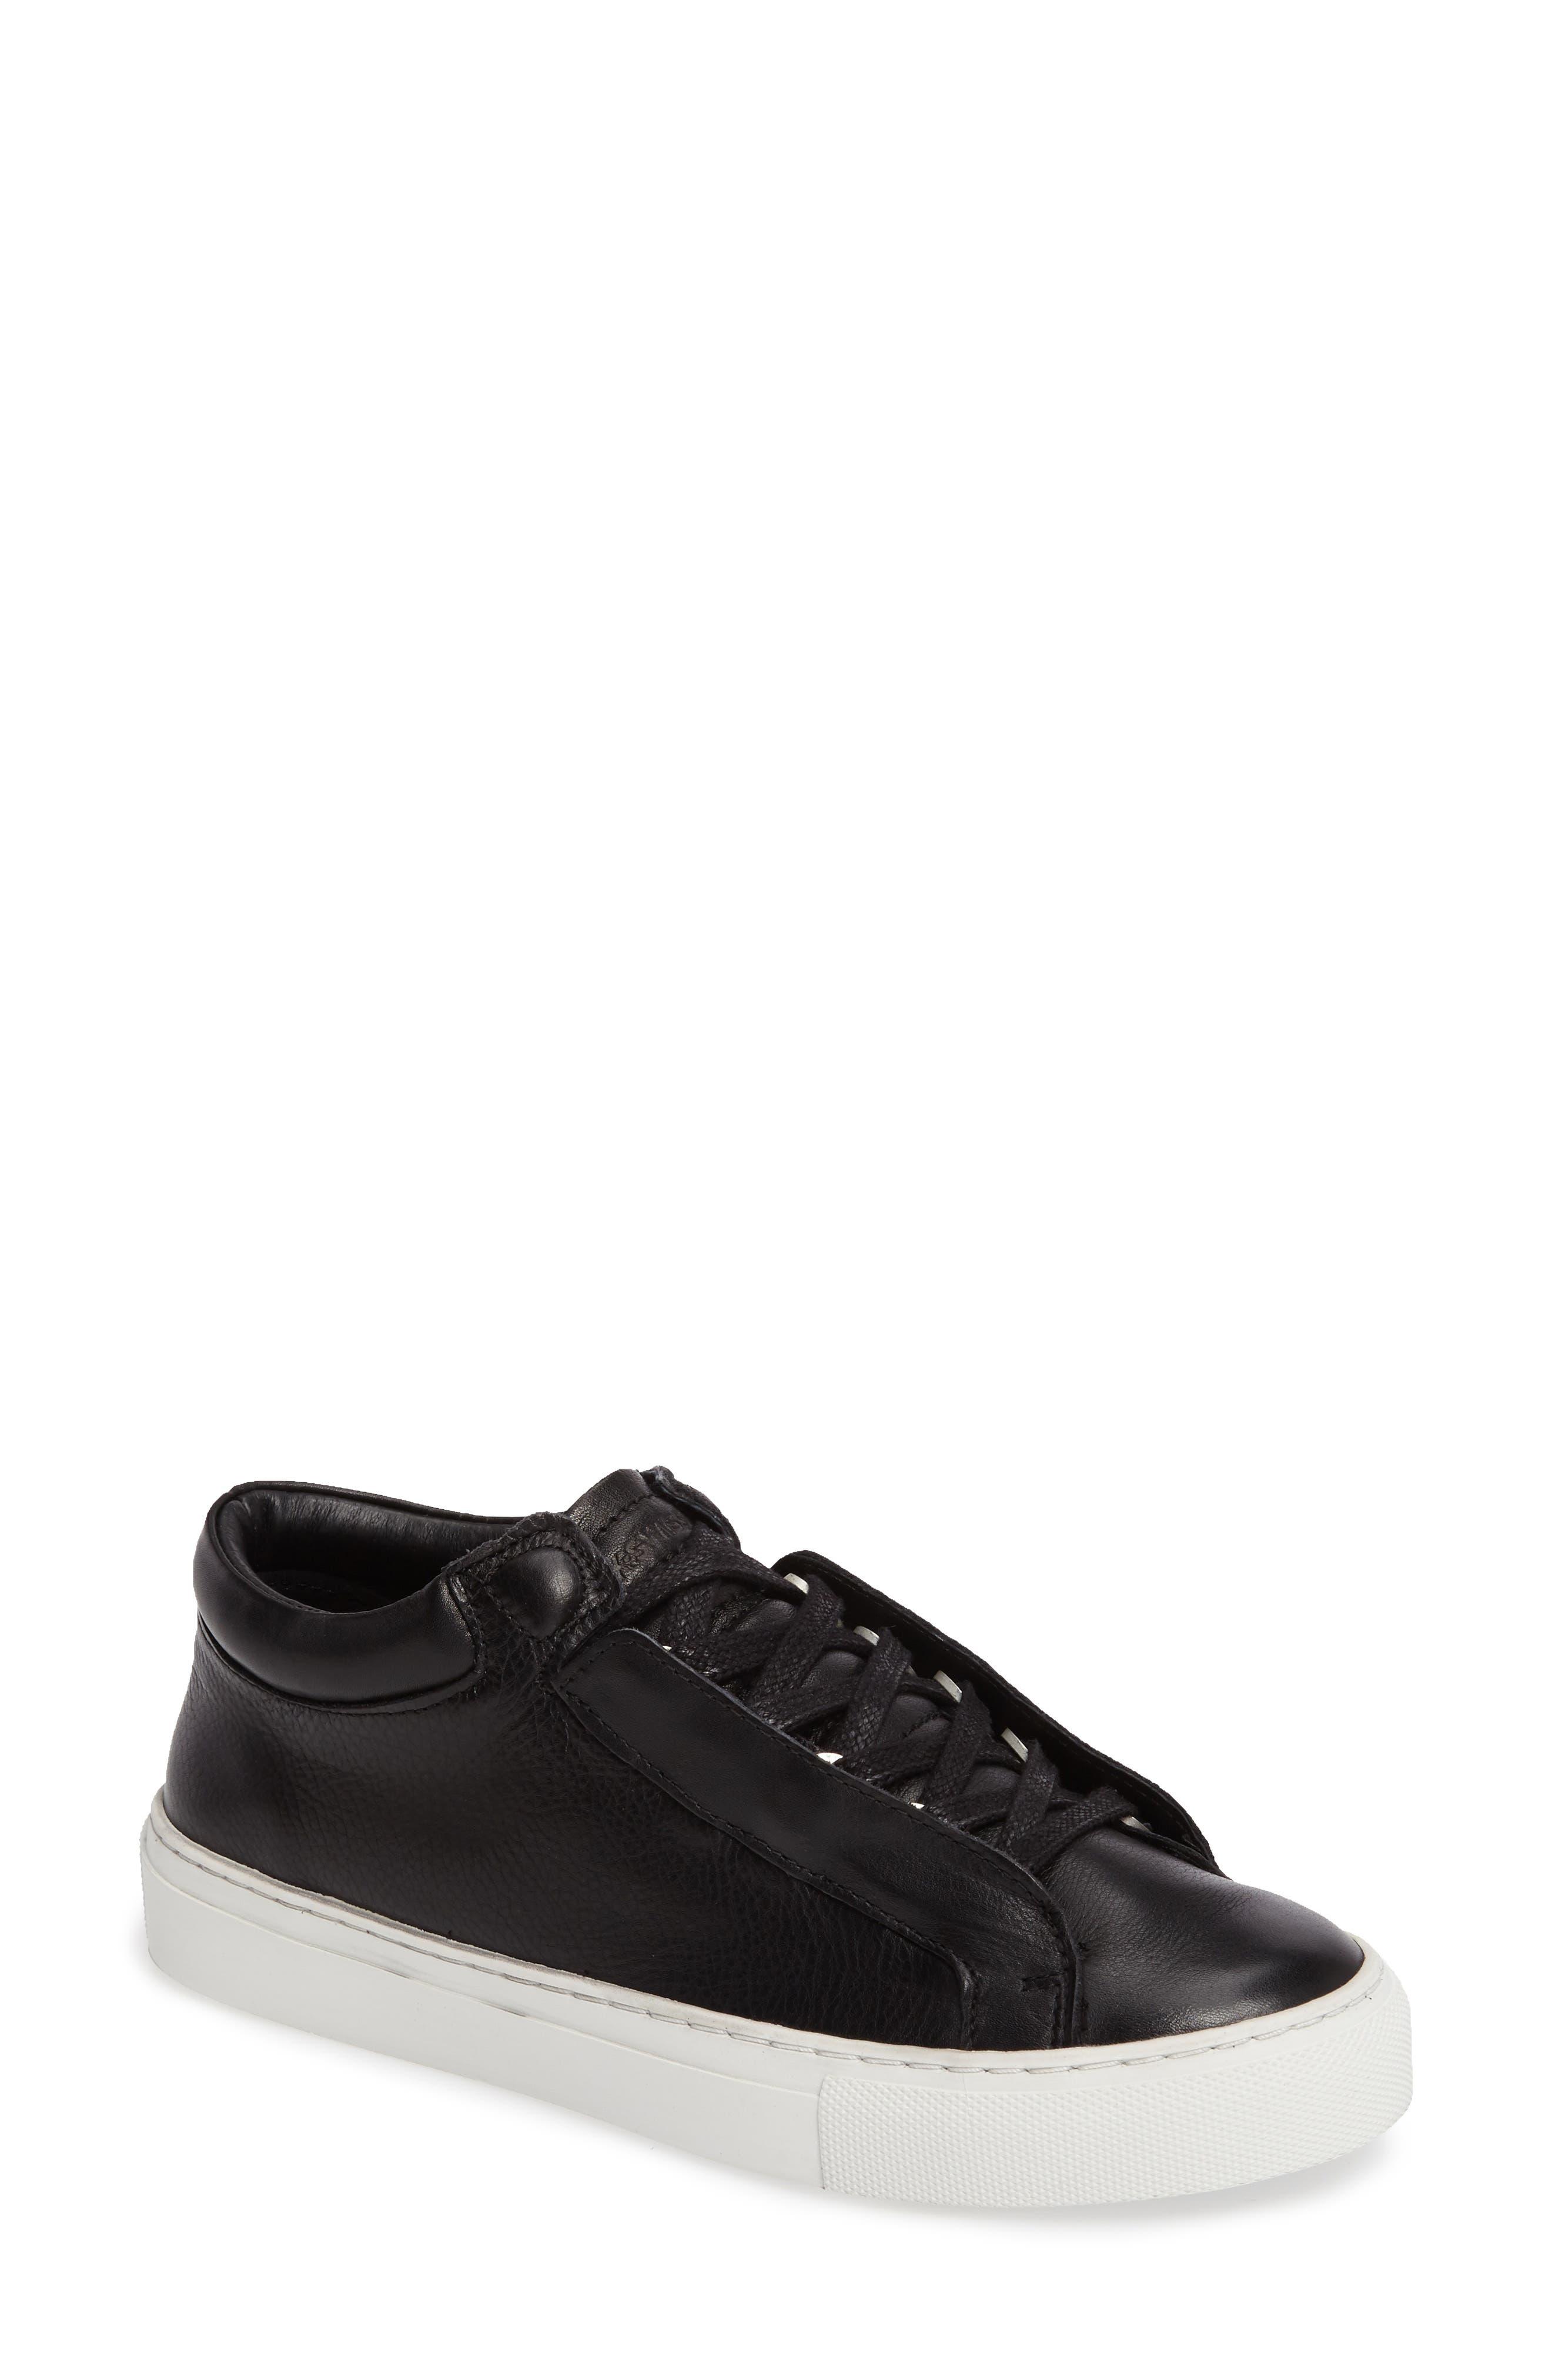 Novo Demi Sneaker,                             Main thumbnail 1, color,                             Black/ Off White